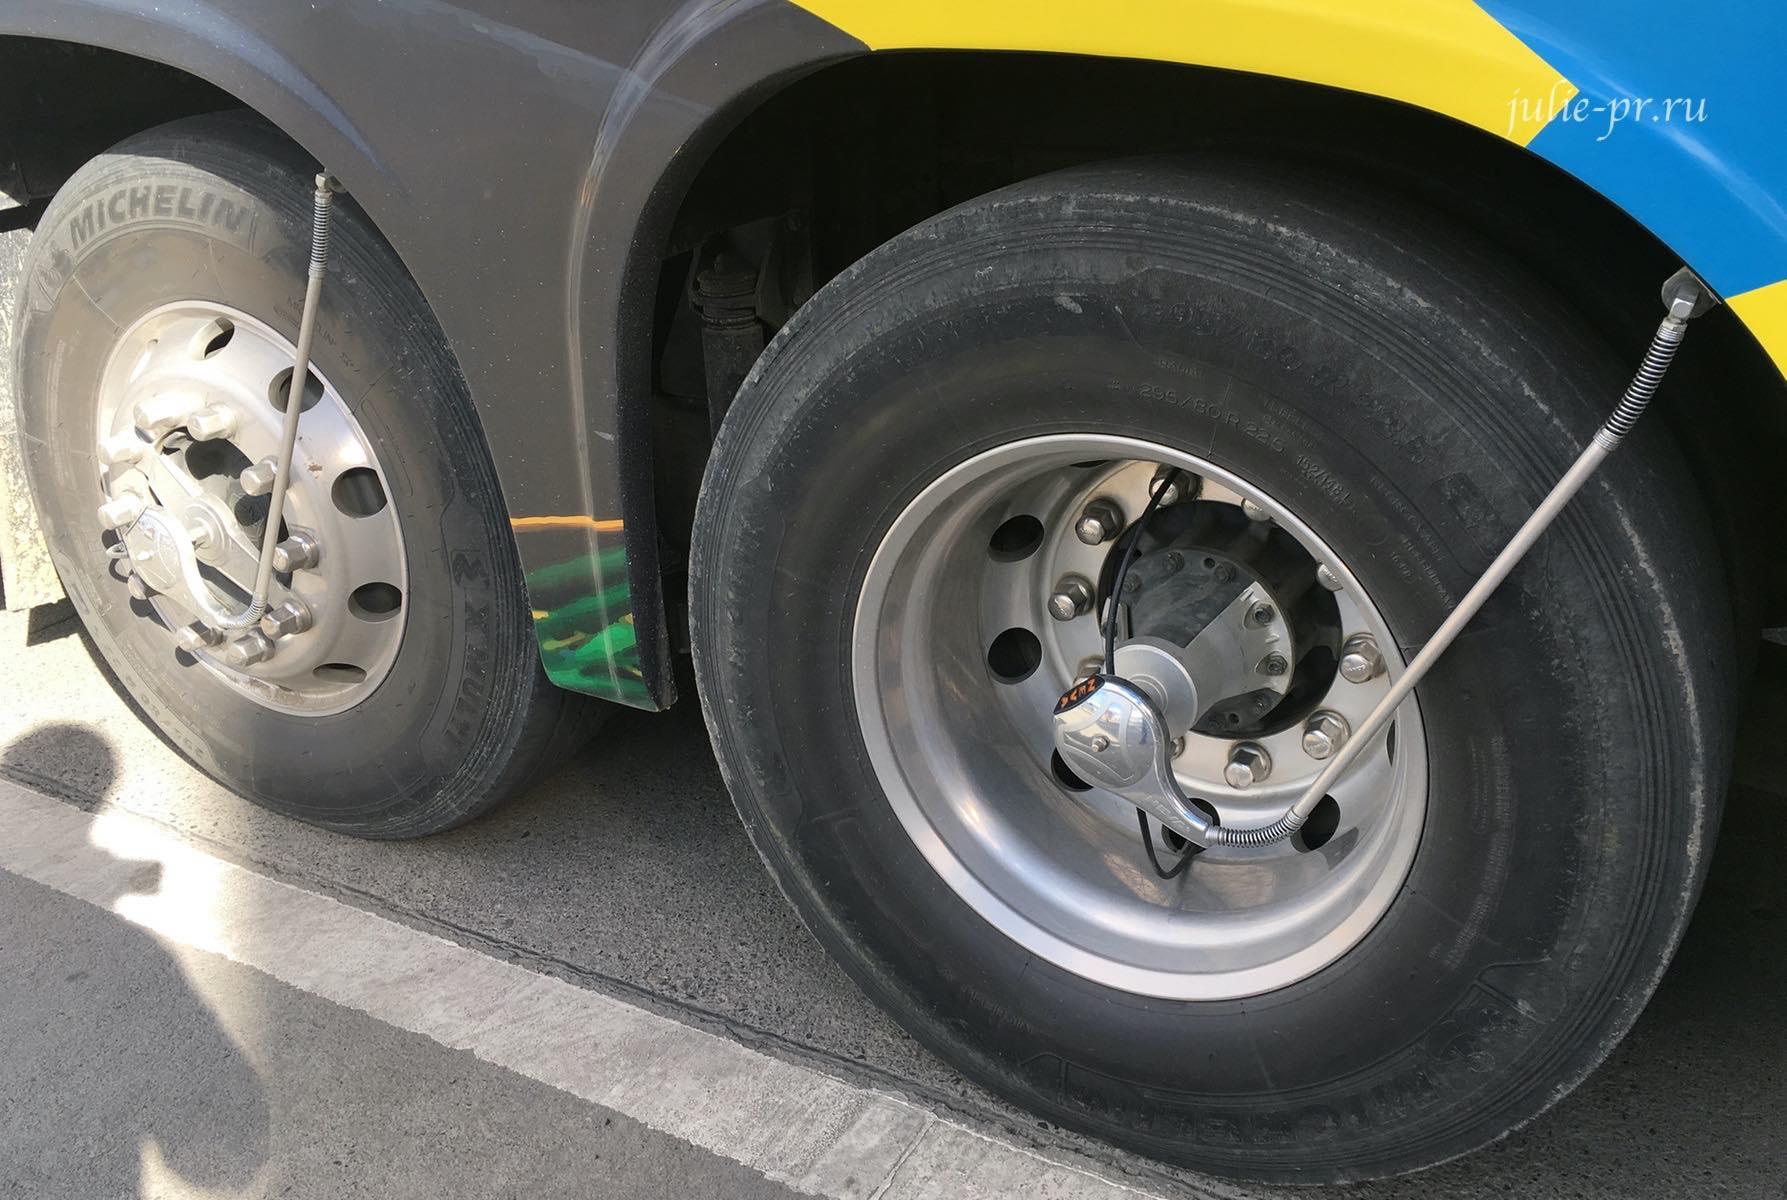 Аргентина, автобус, система подкачки колёс